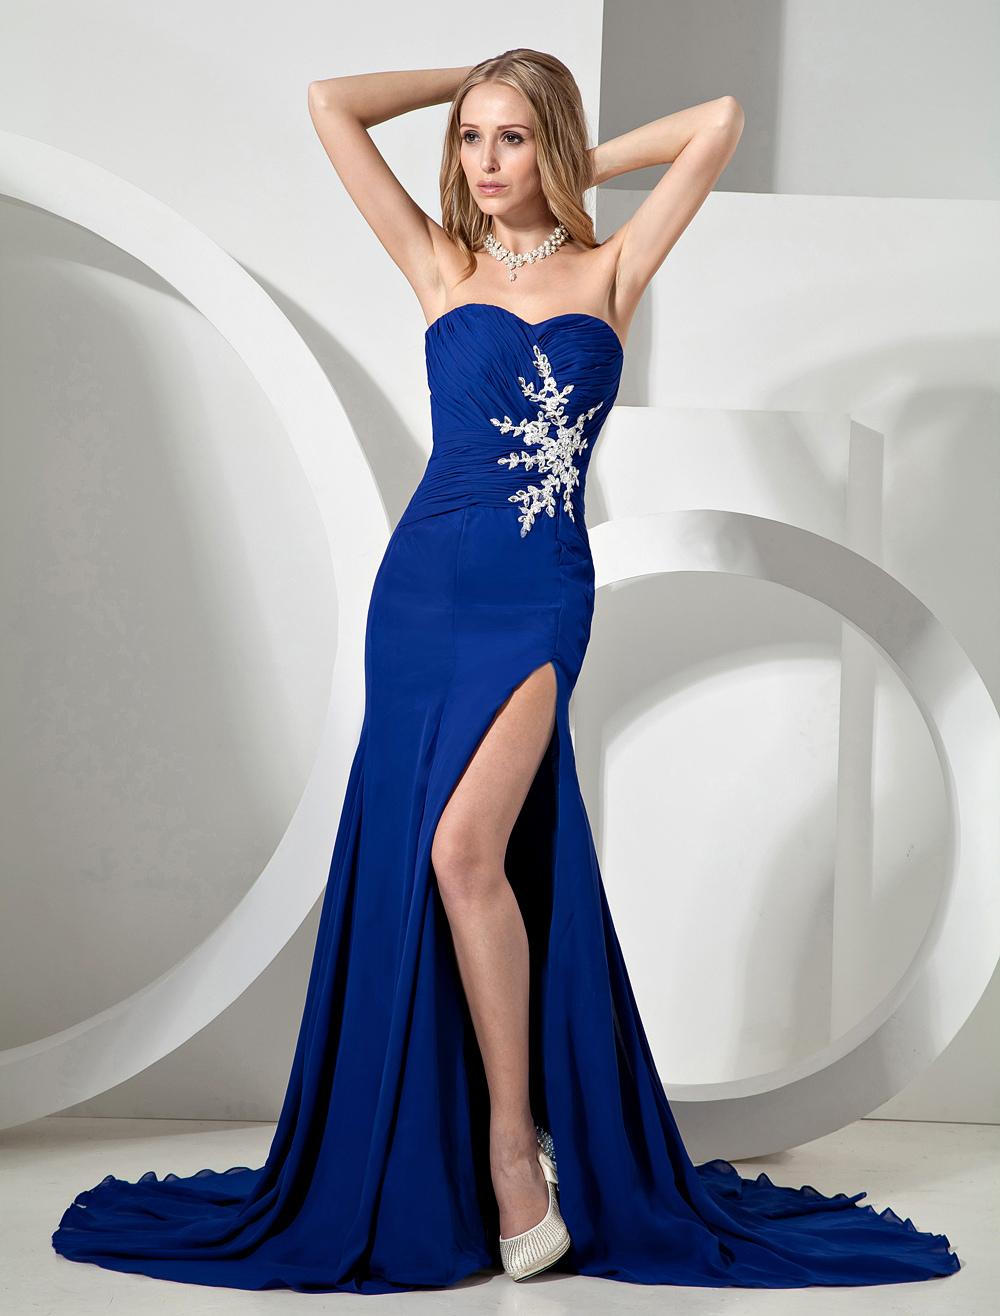 Royal Blue Splitting Strapless Chiffon Prom Dress (Wedding Prom Dresses) photo